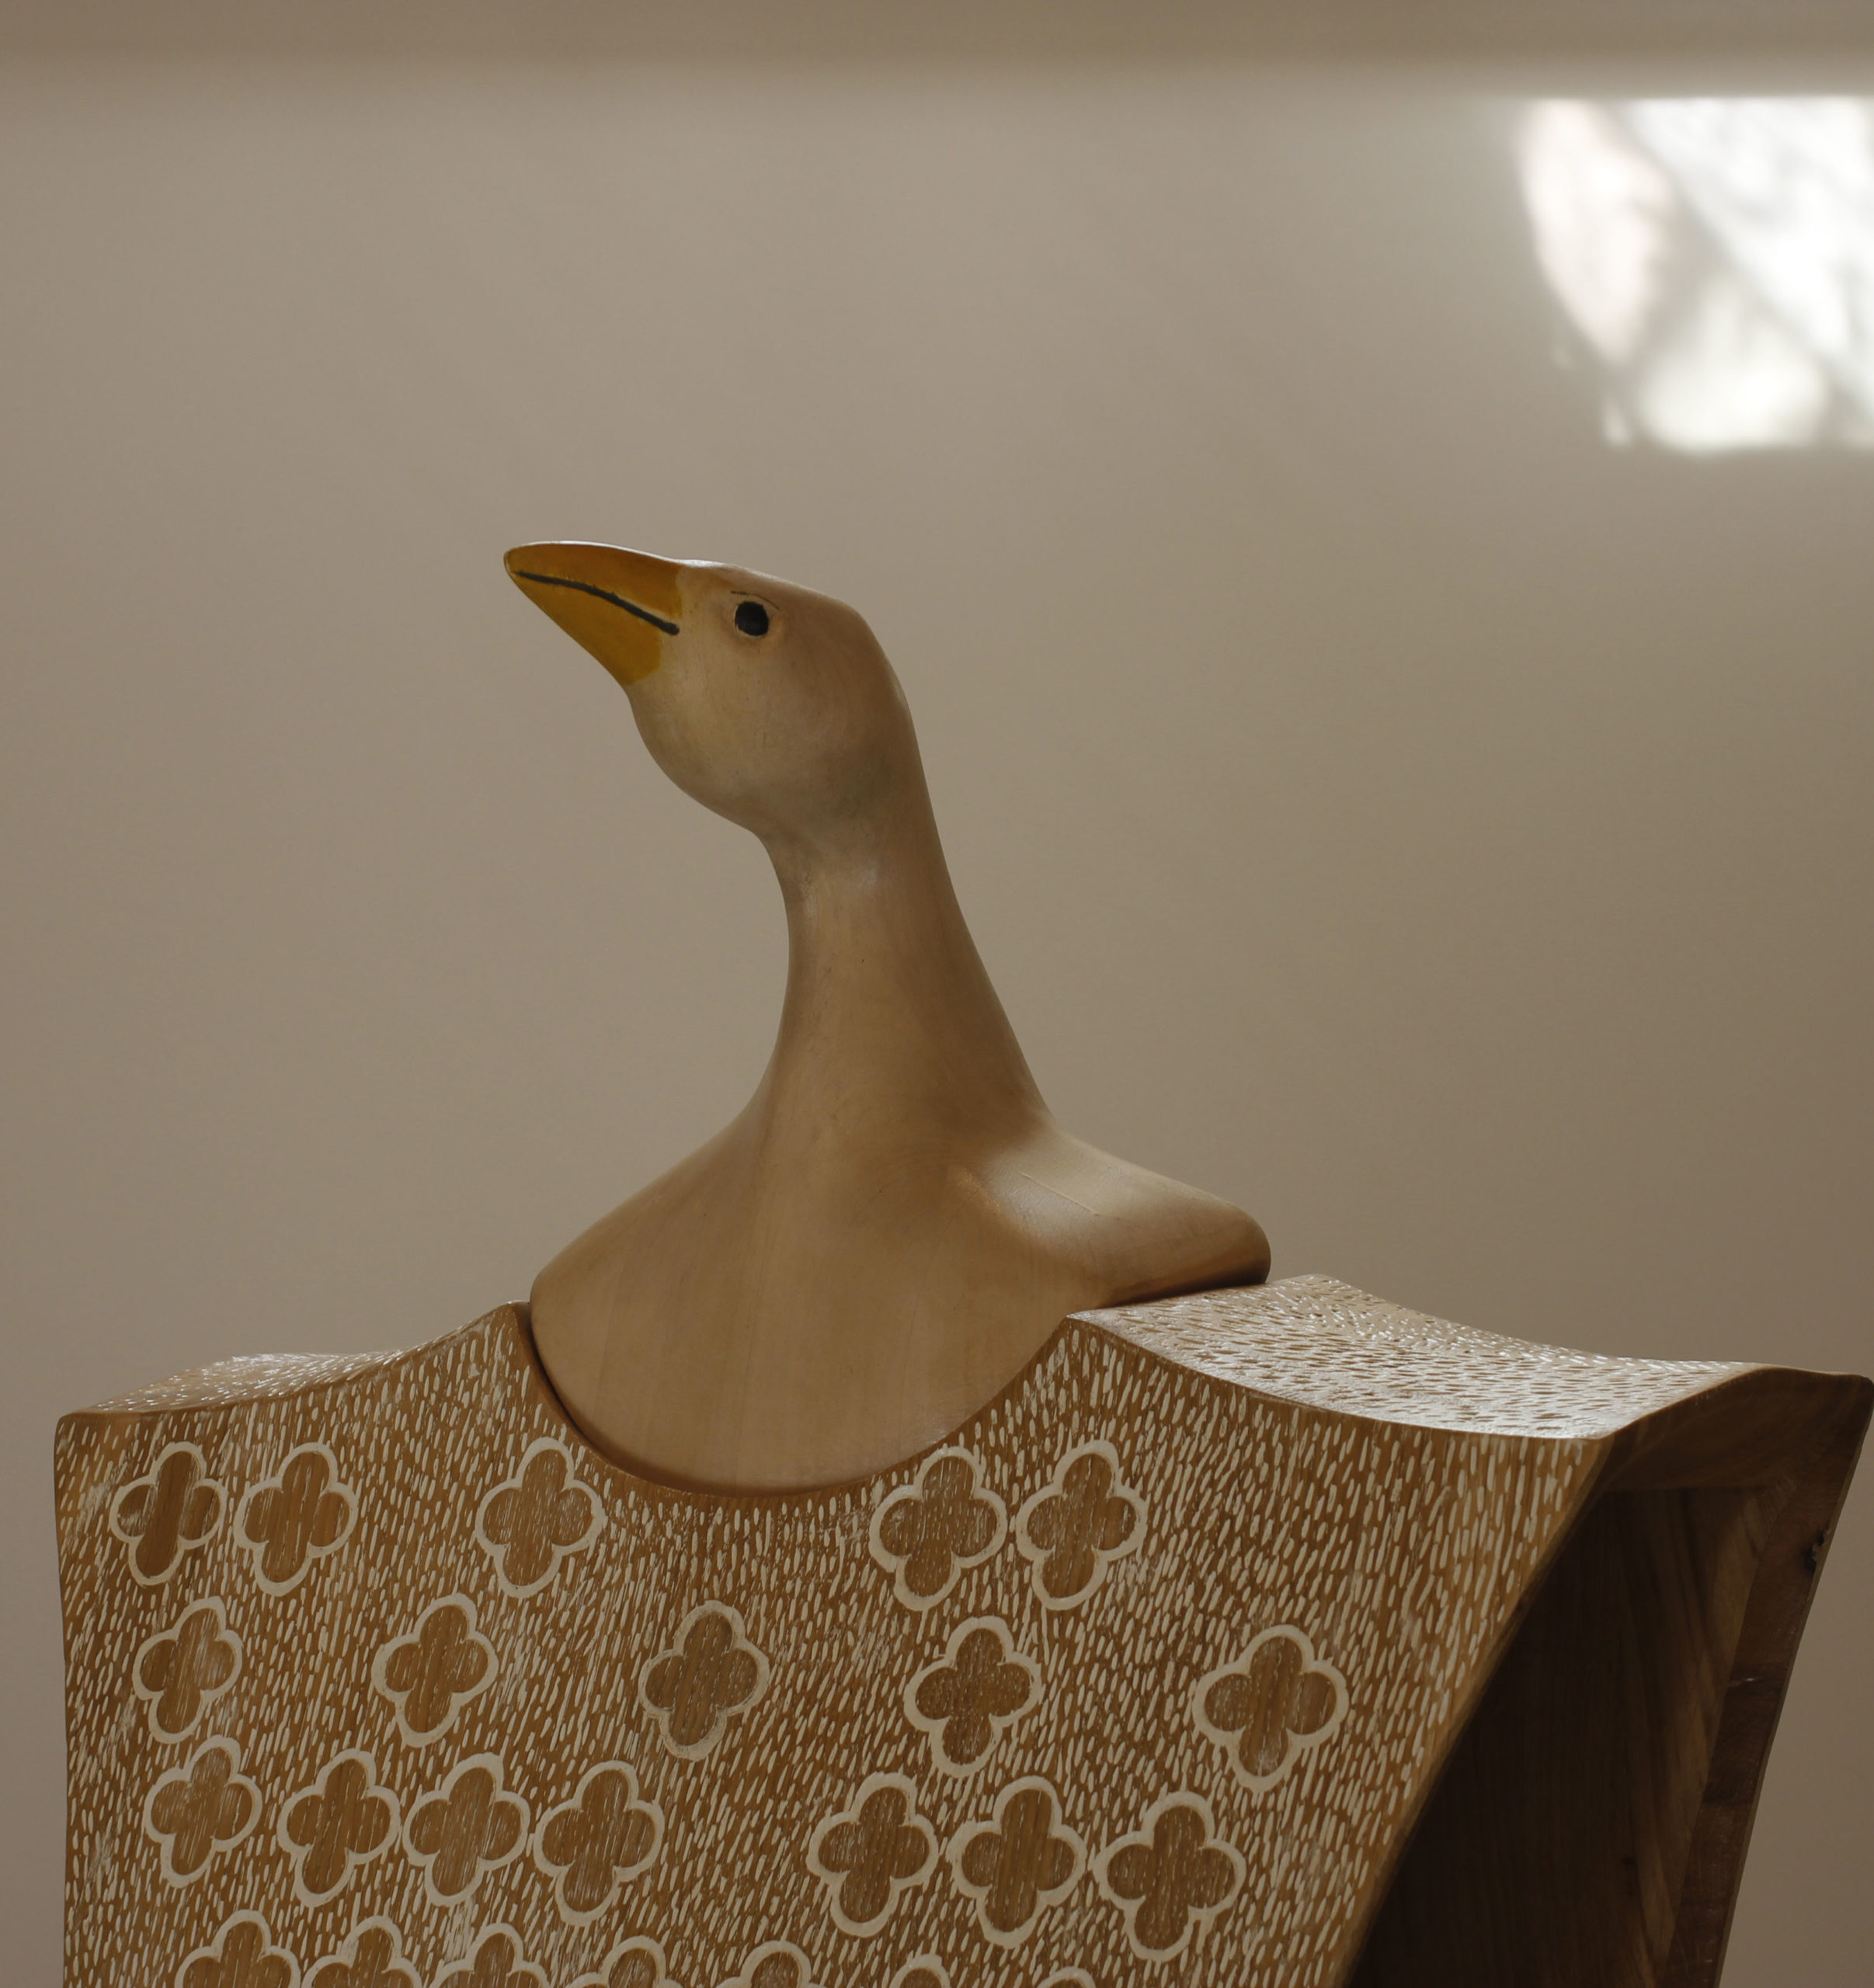 Chêne sculpté teinté  180 x 60 x 30 cm